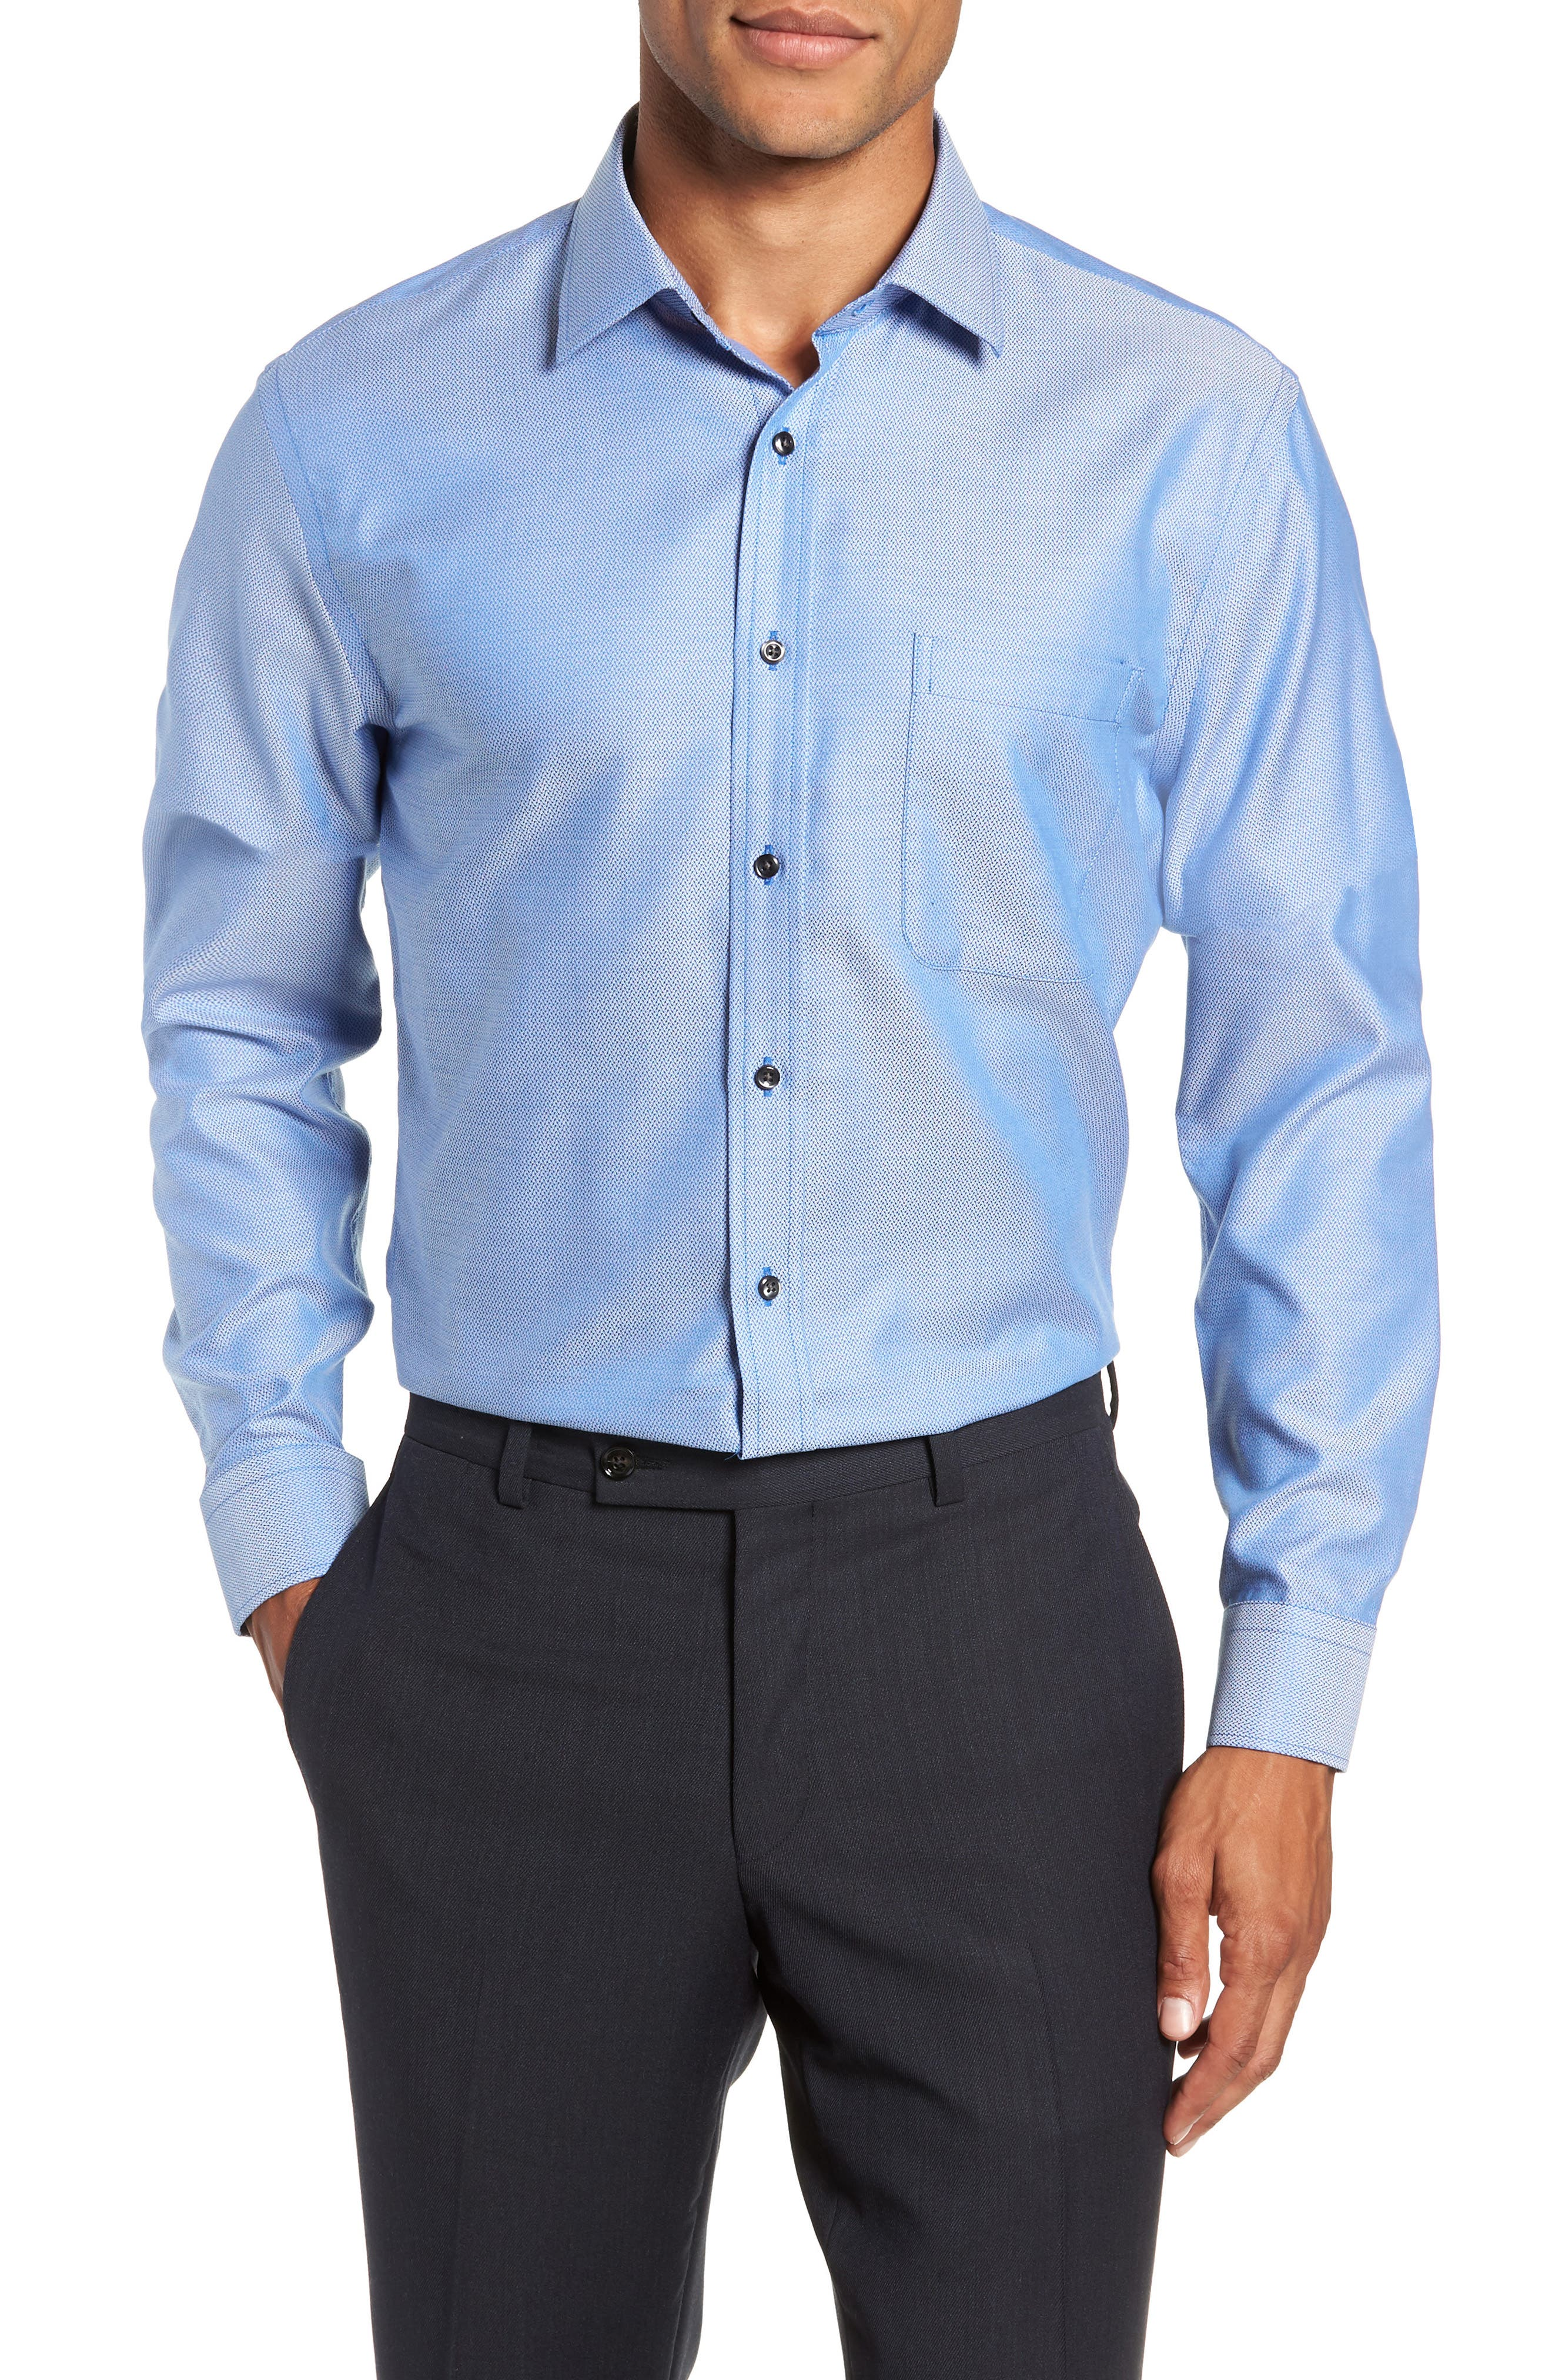 Trim Fit No-Iron Geometric Dress Shirt,                             Main thumbnail 1, color,                             BLUE CAMP